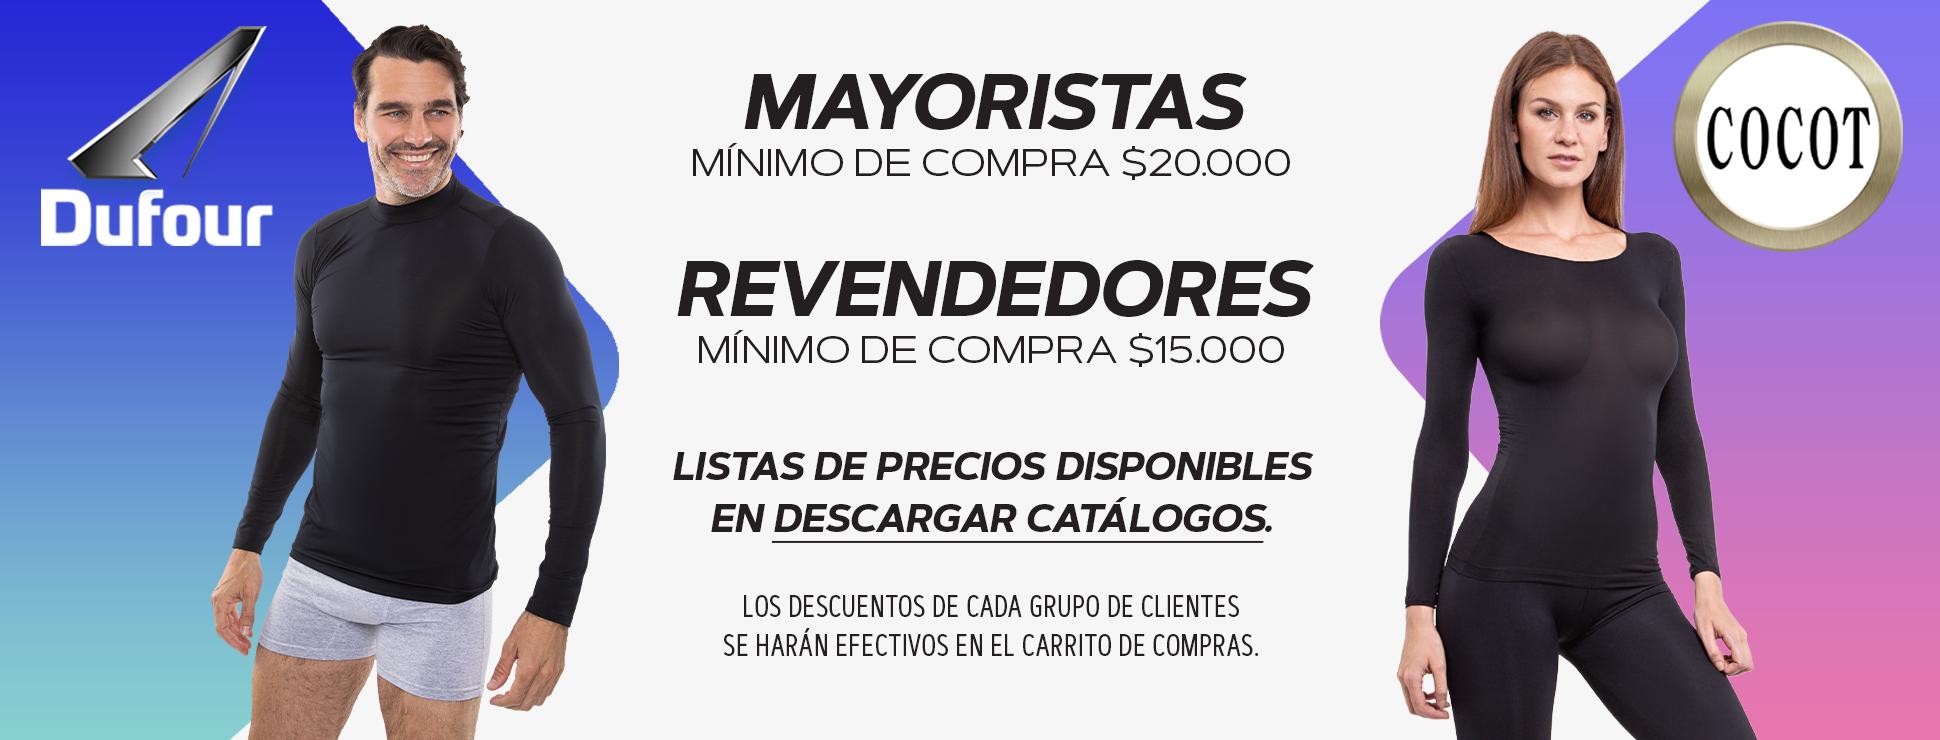 https://www.cocotonlinemayorista.com.ar/catalogos